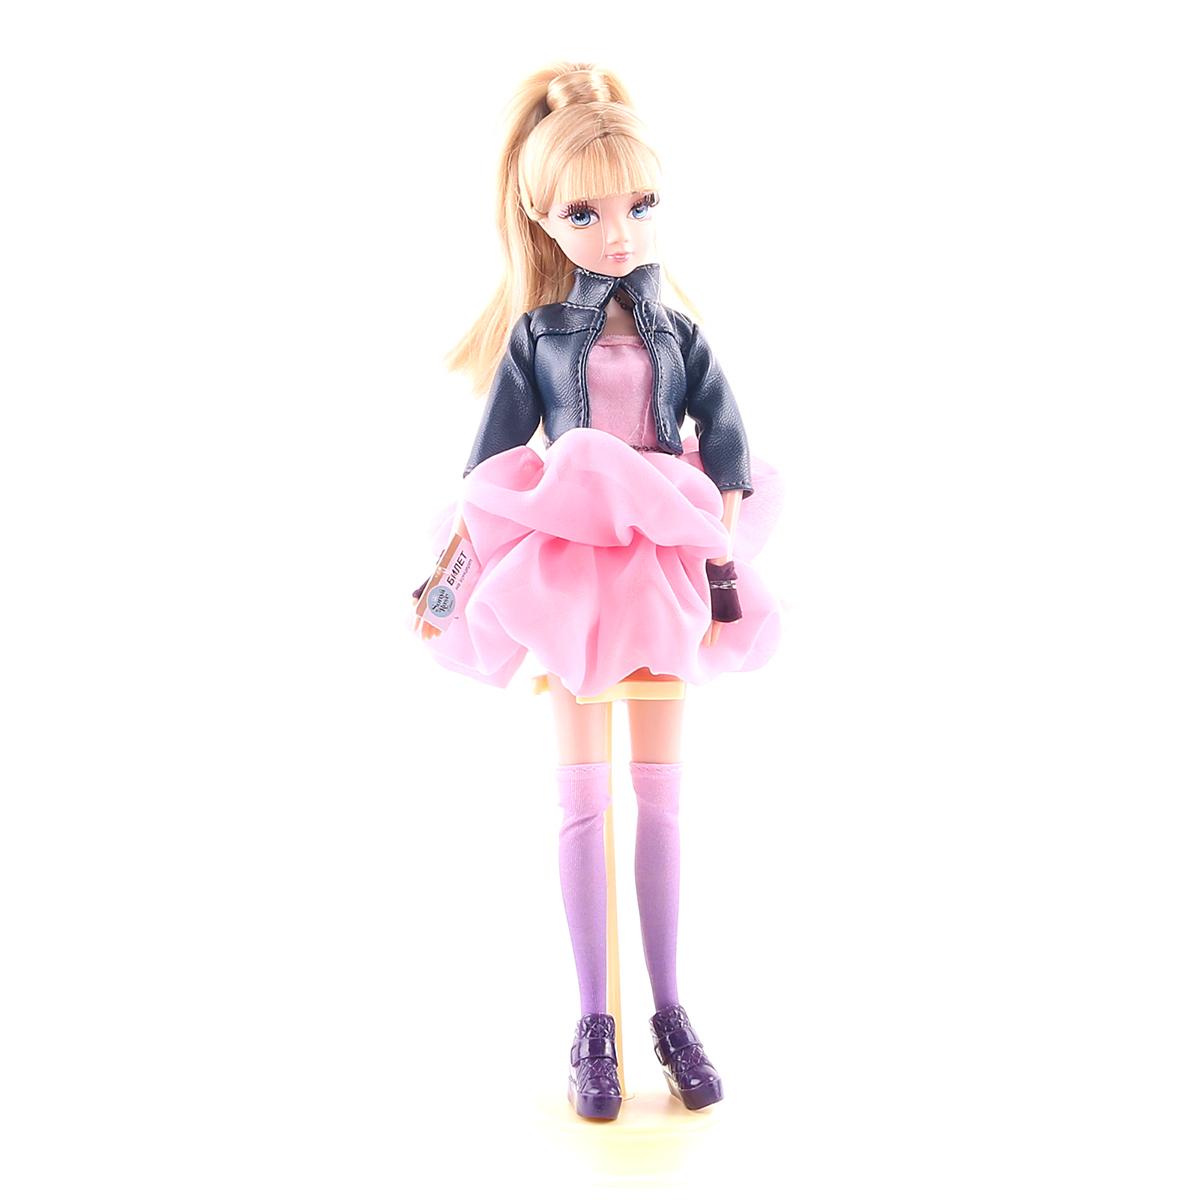 Кукла SONYA Daily collection, Музыкальная вечеринка кукла sonya rose музыкальная вечеринка